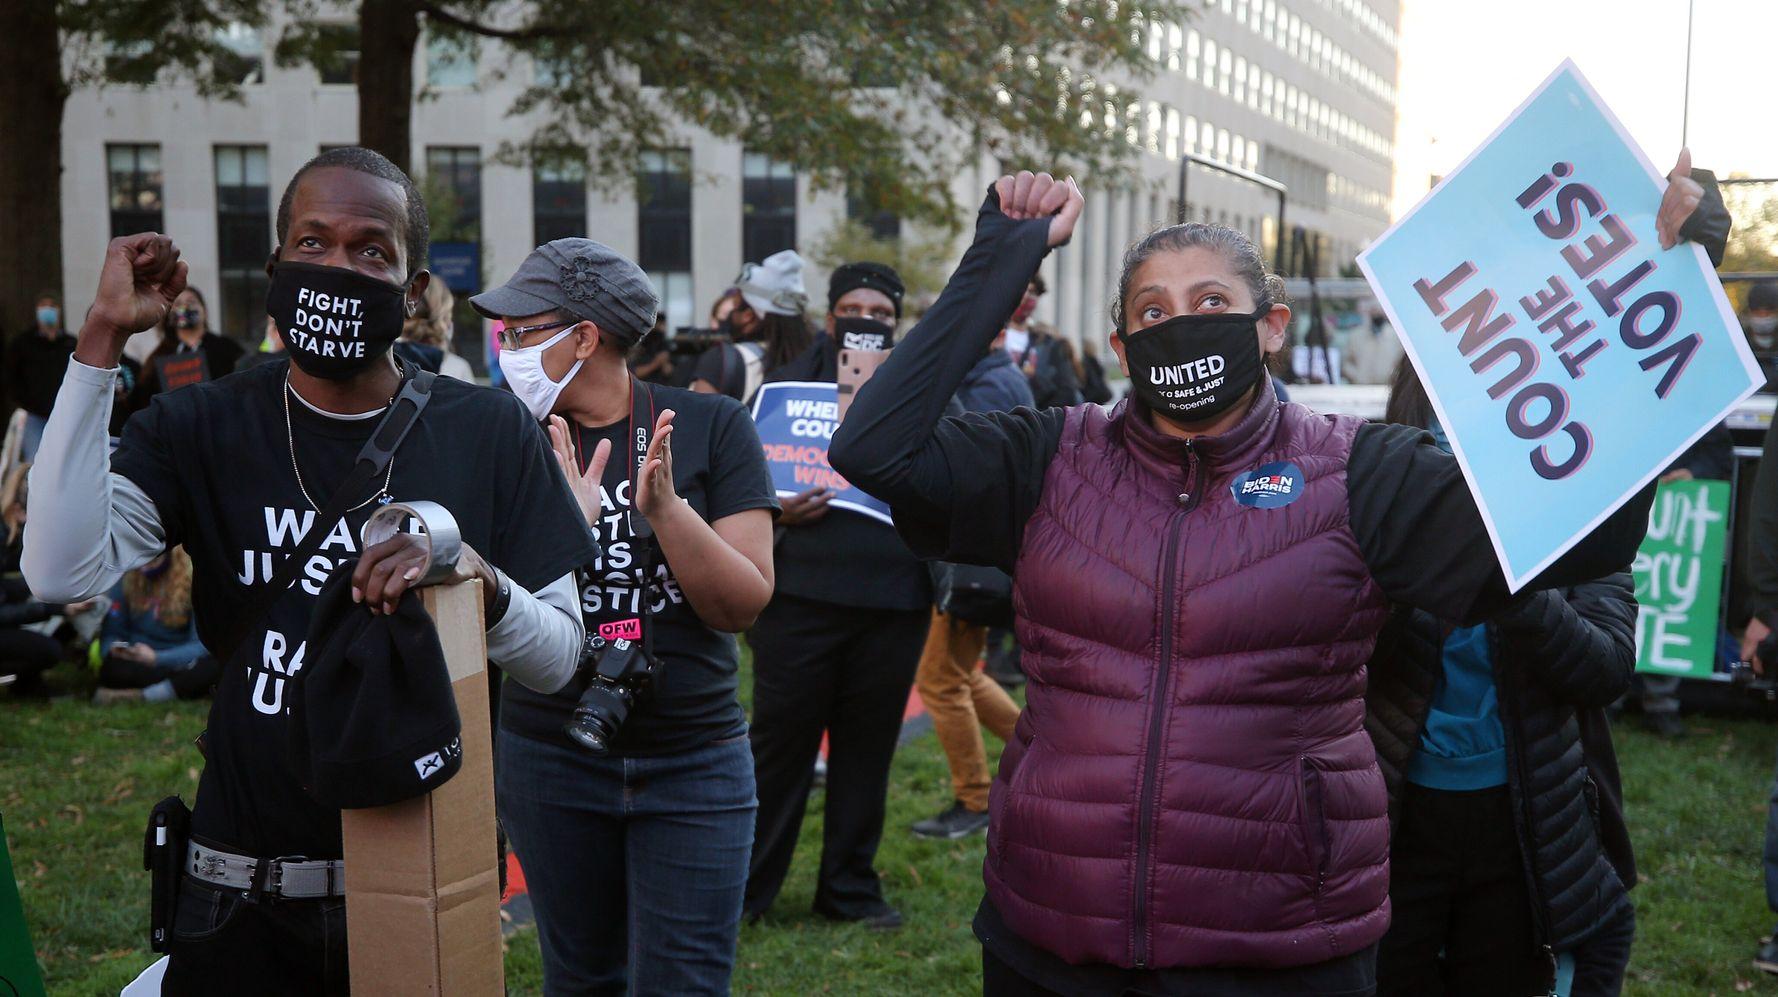 Coronavirus Live Updates: U.S. Sets Record For Cases Amid Election Battle